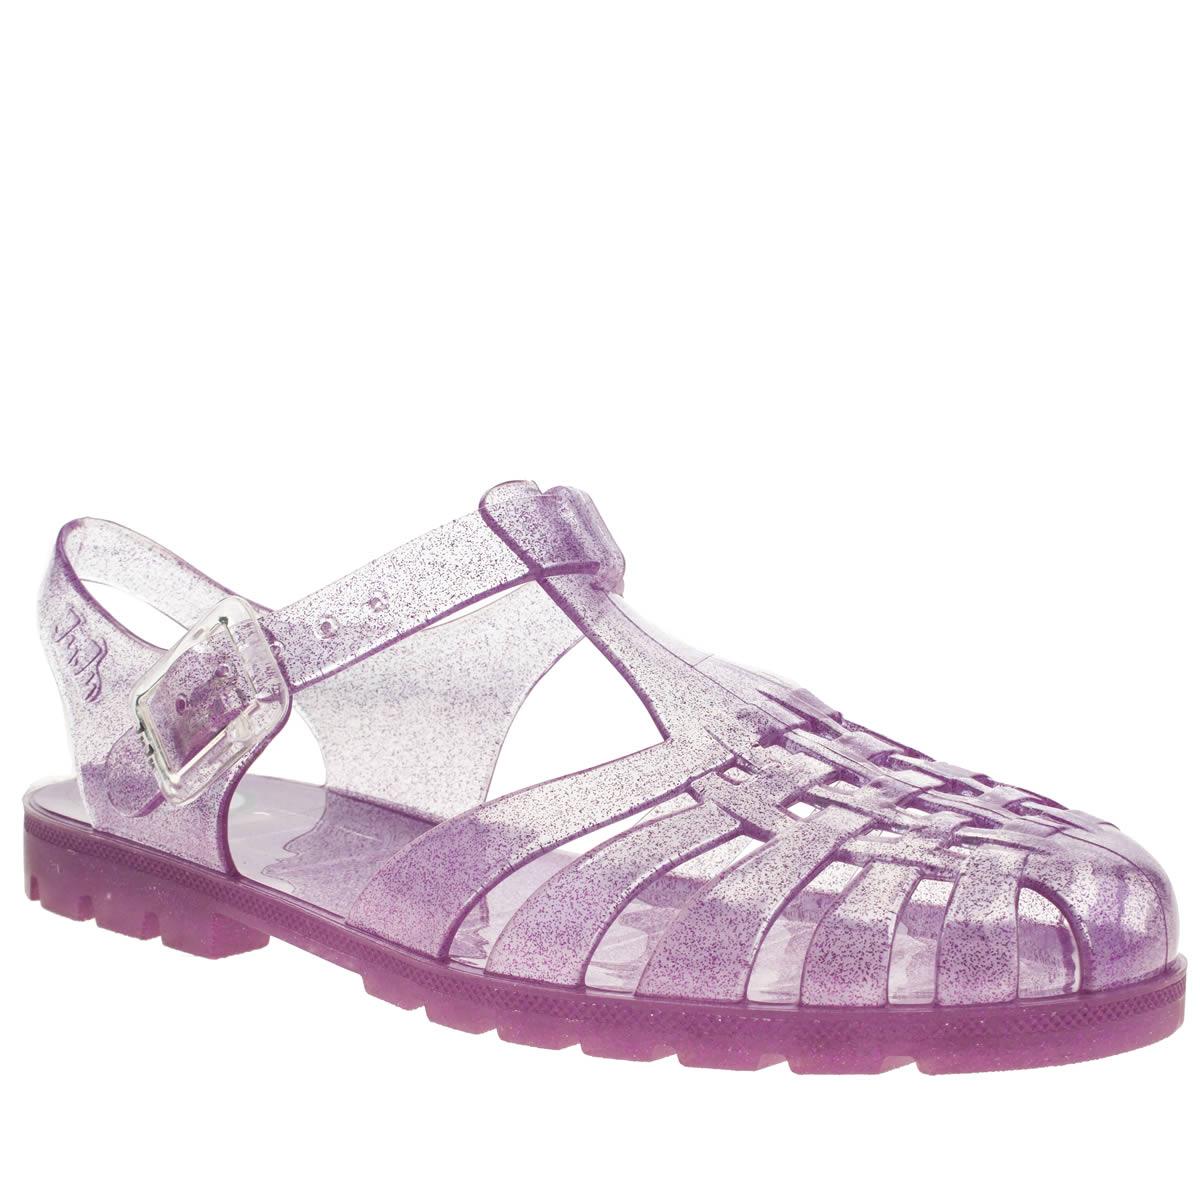 juju jellies Juju Jellies Purple Reilly Sandals